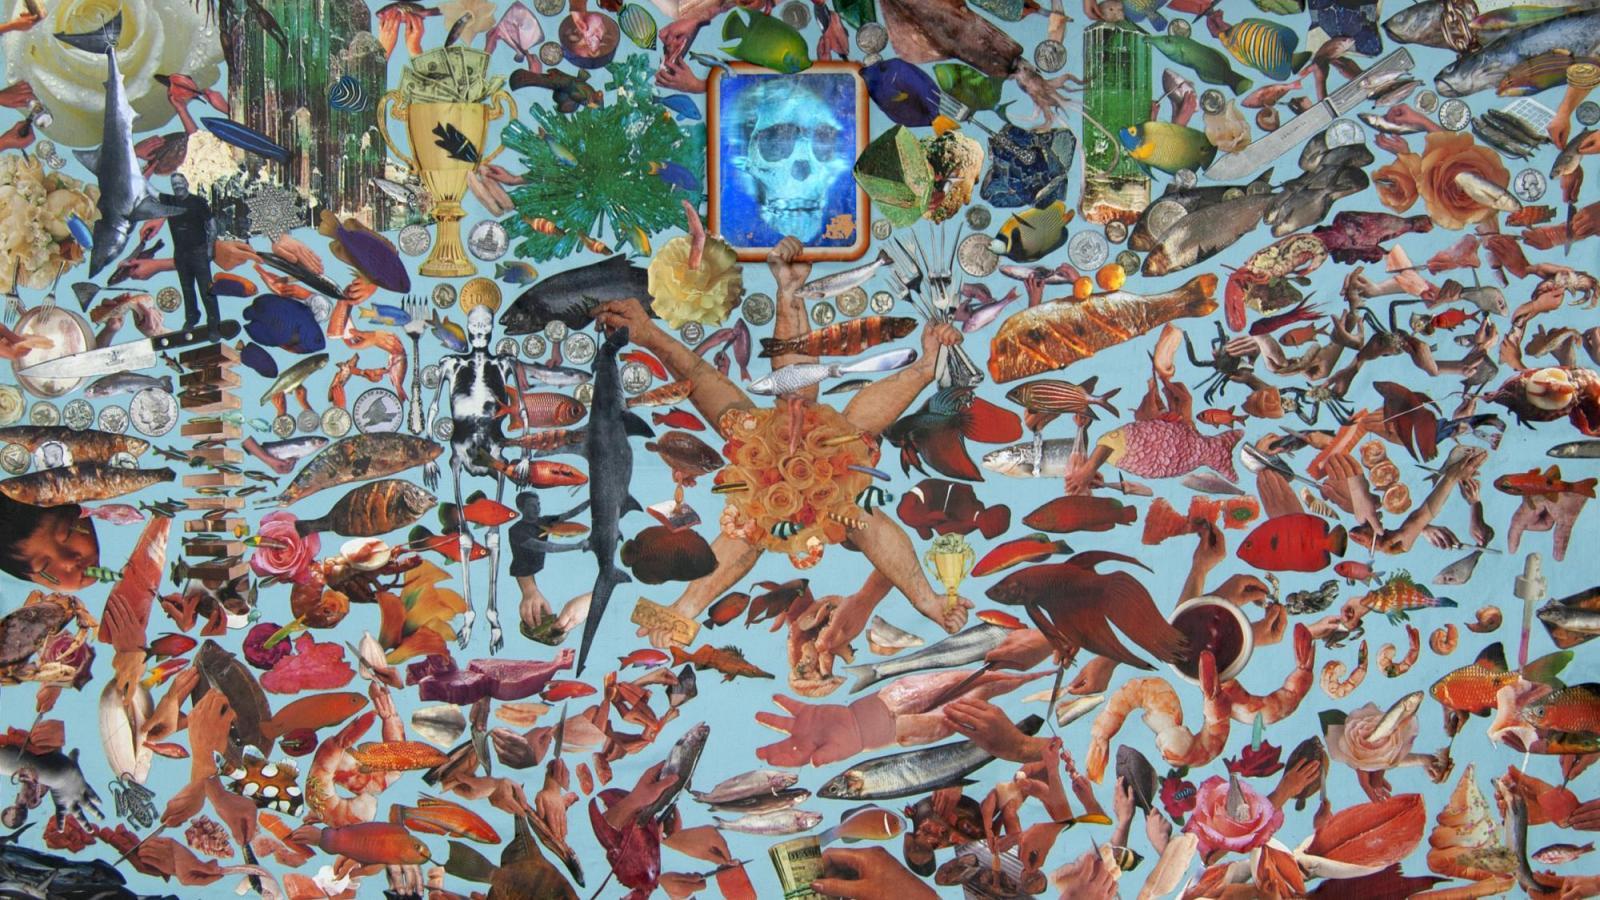 Marsella artwork